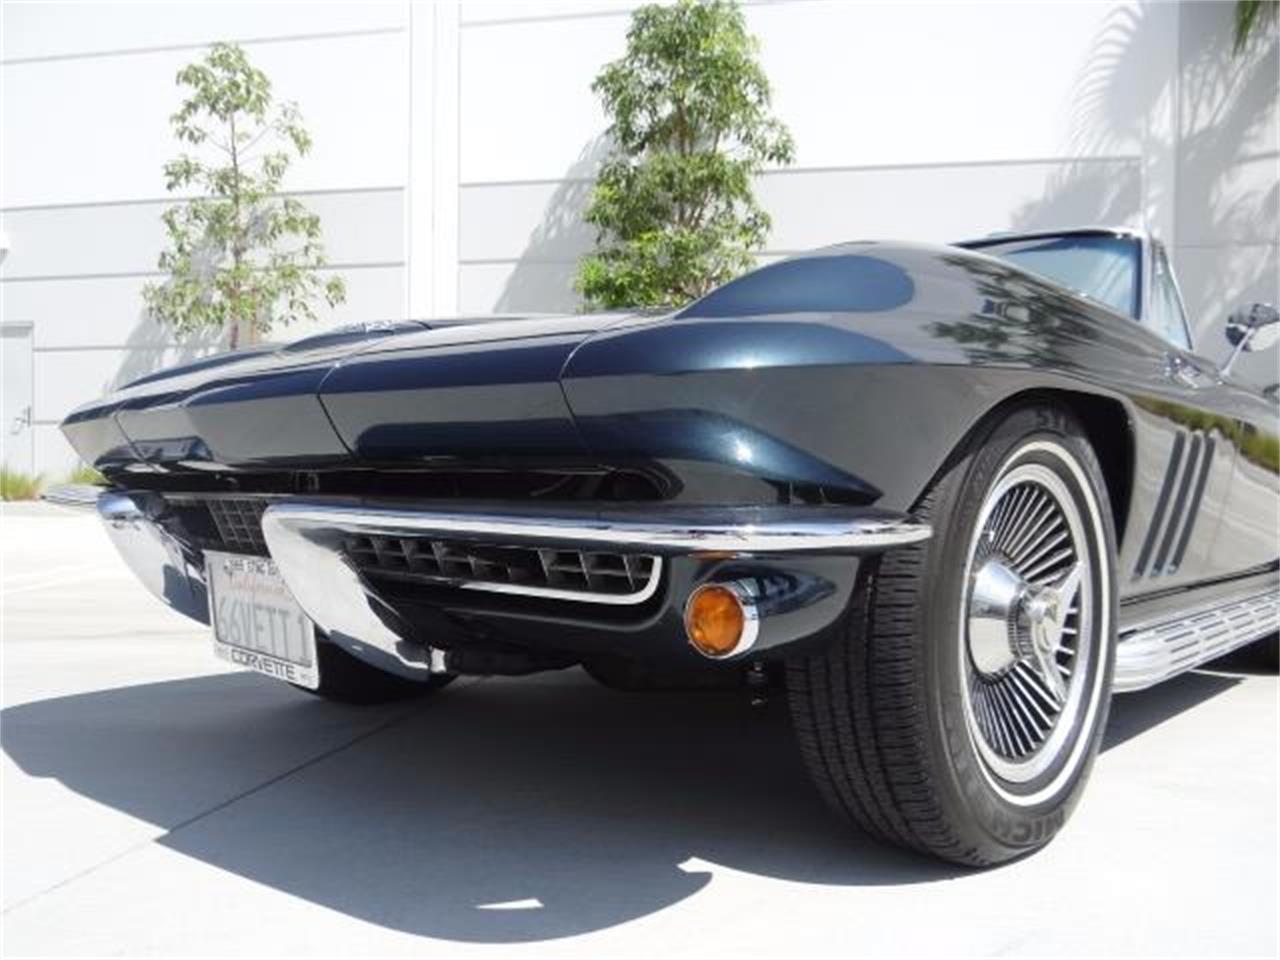 Large Picture of Classic 1966 Corvette located in California - $65,000.00 - LEPG